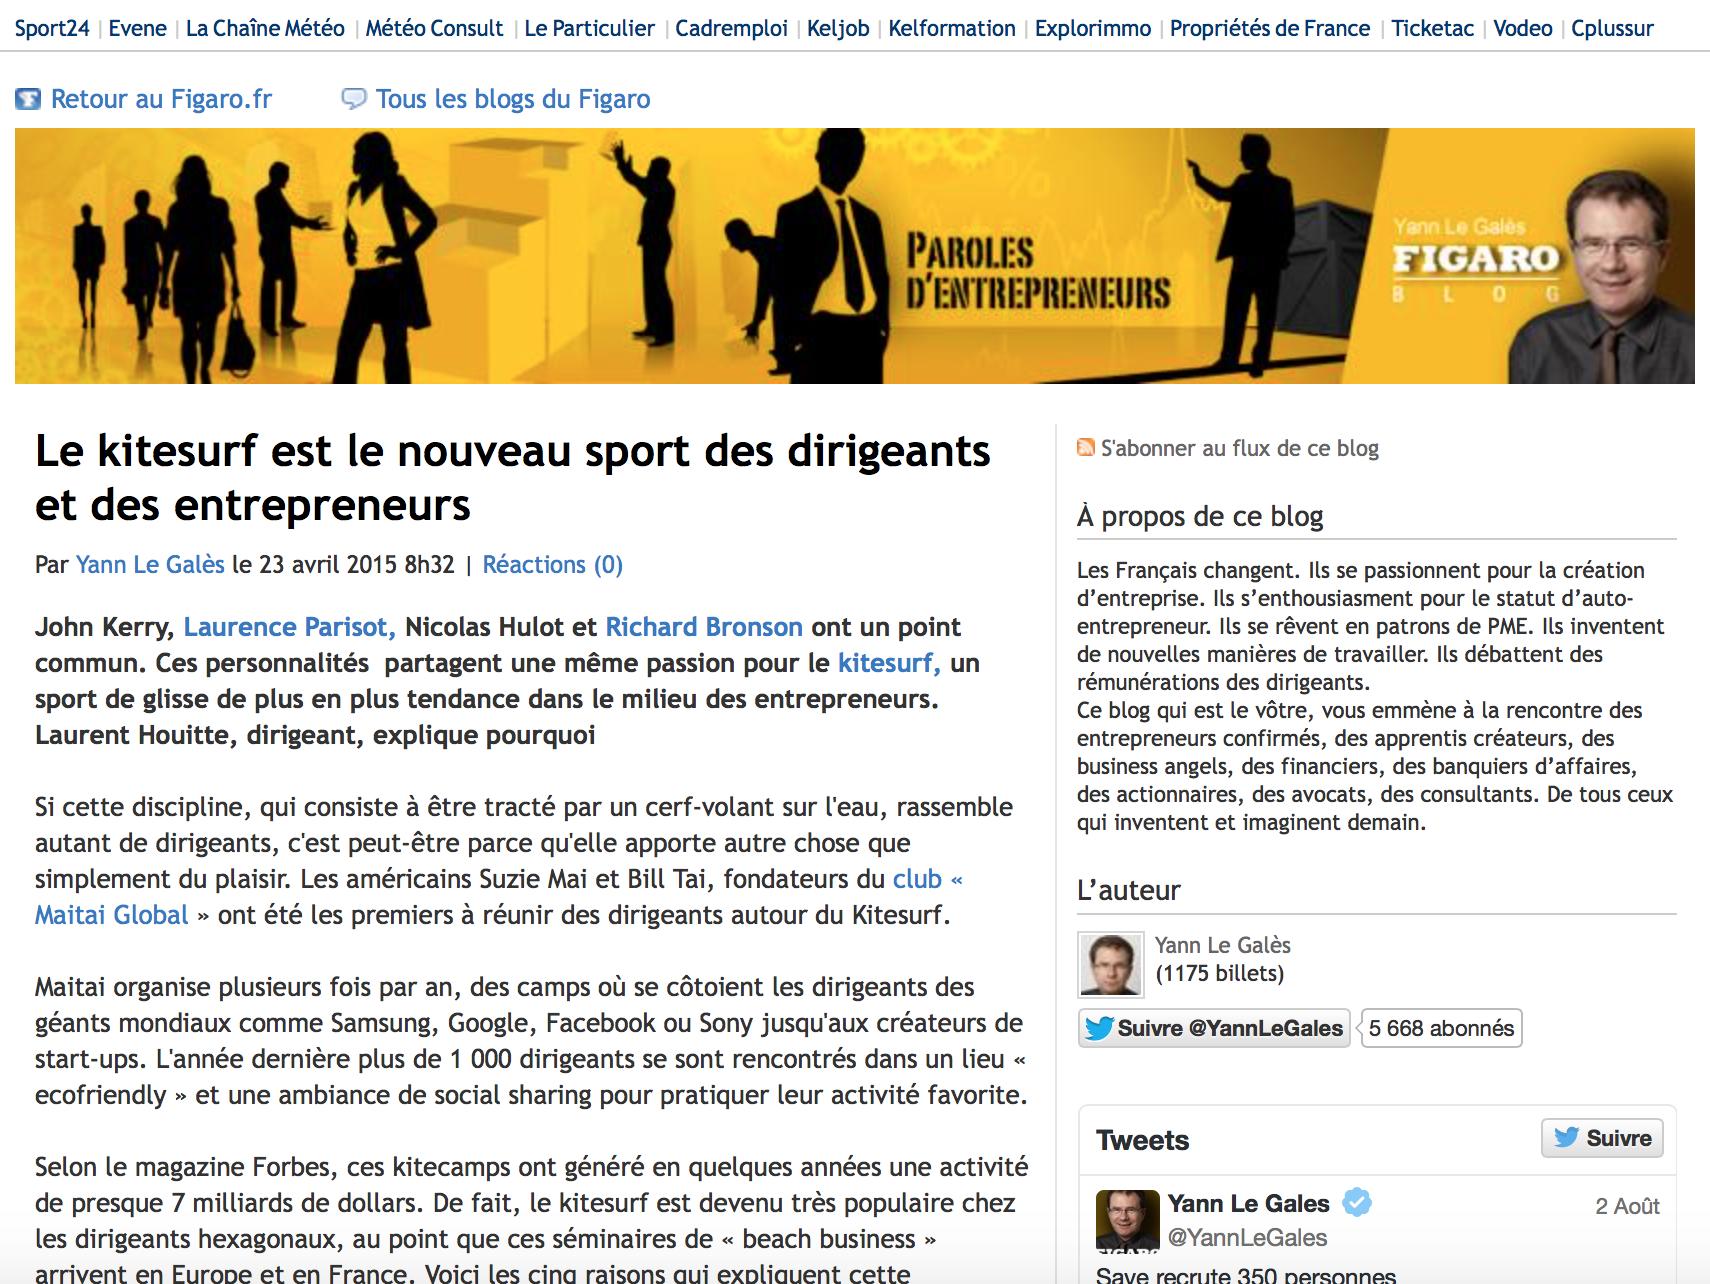 Blog Le Figaro